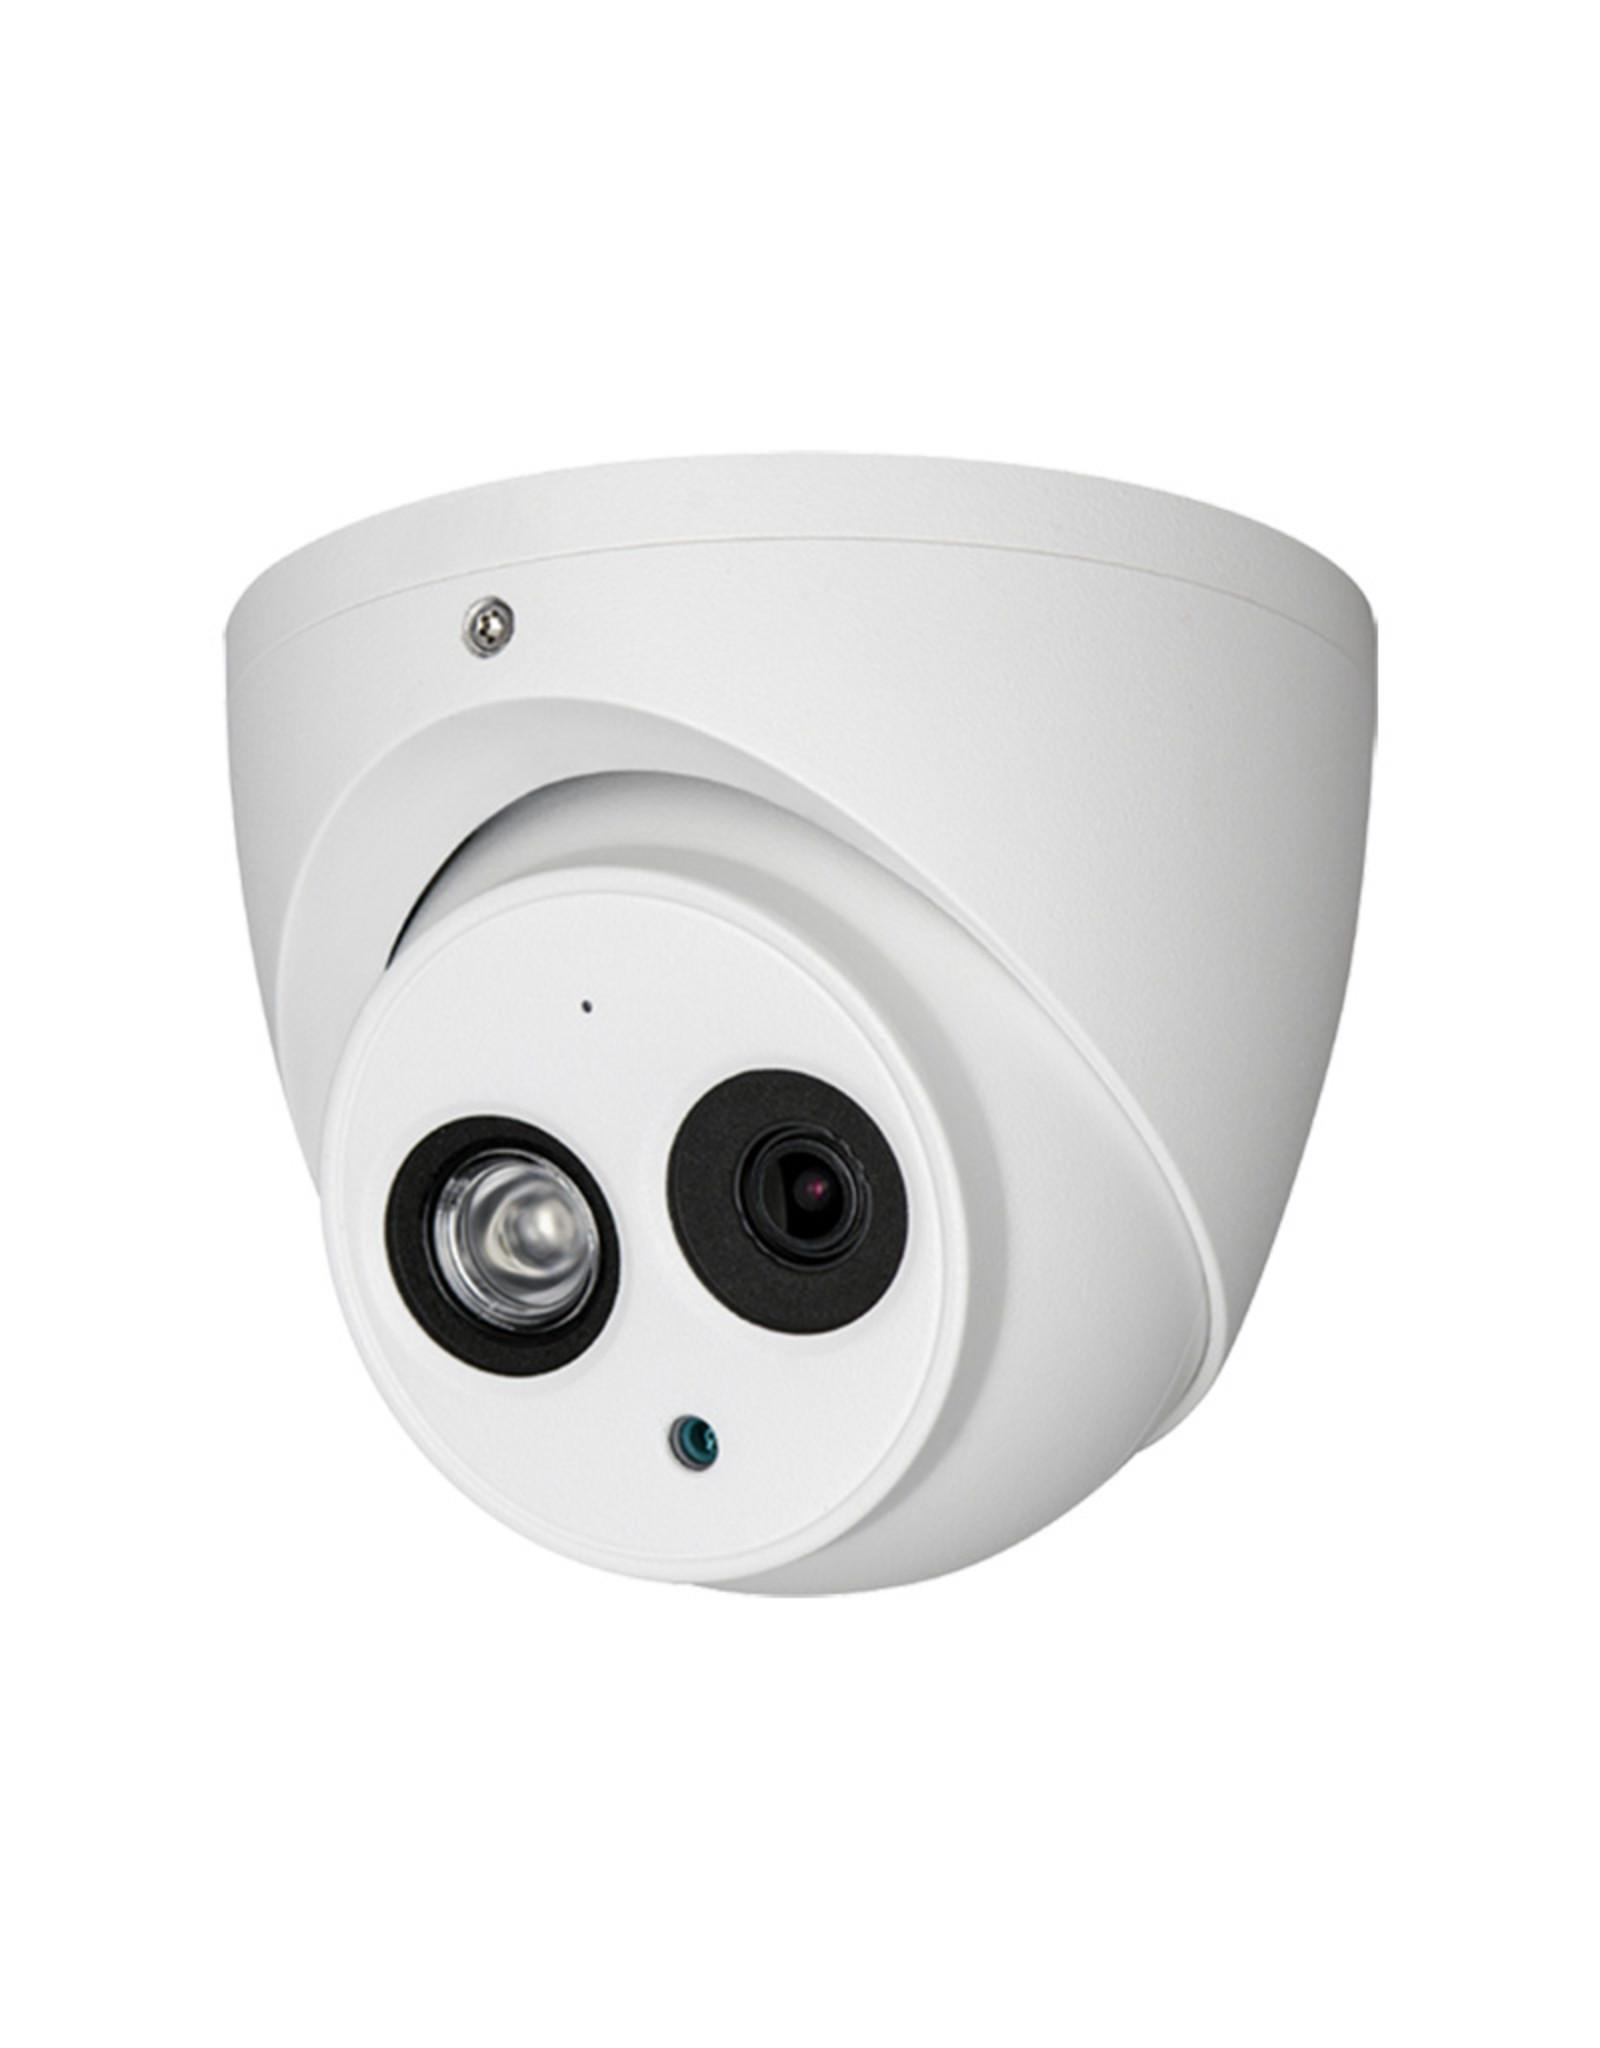 X-Security X-Security XS-DM885A-Q4N1